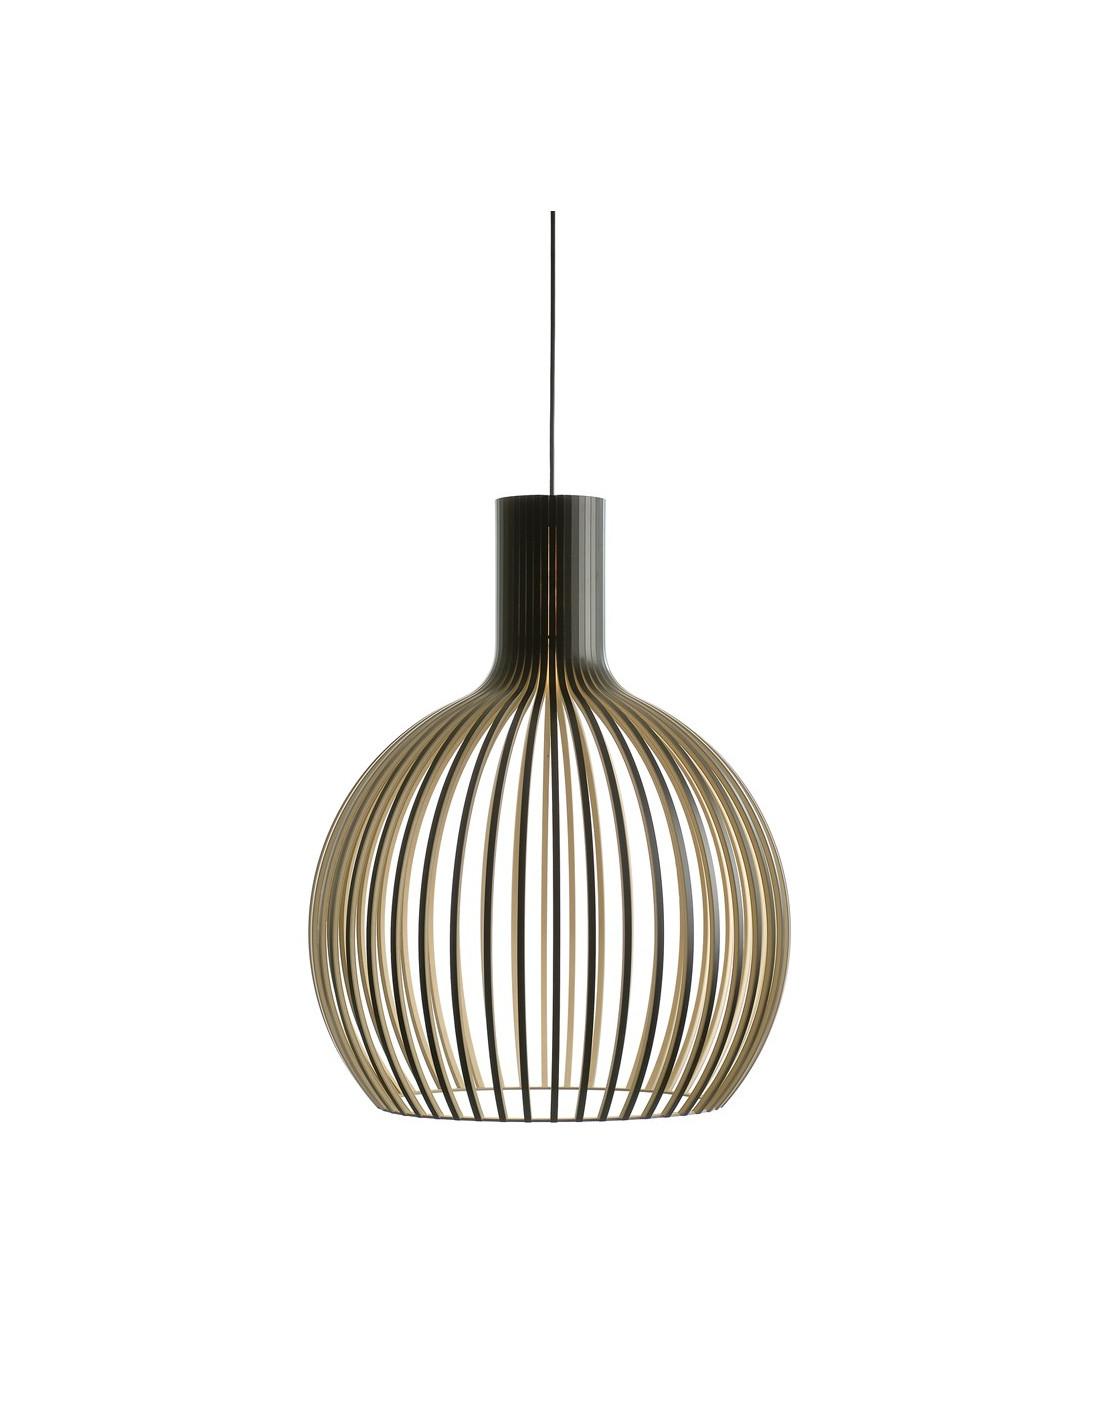 suspension octo ou 4240 design seppo koho la boutique danoise. Black Bedroom Furniture Sets. Home Design Ideas